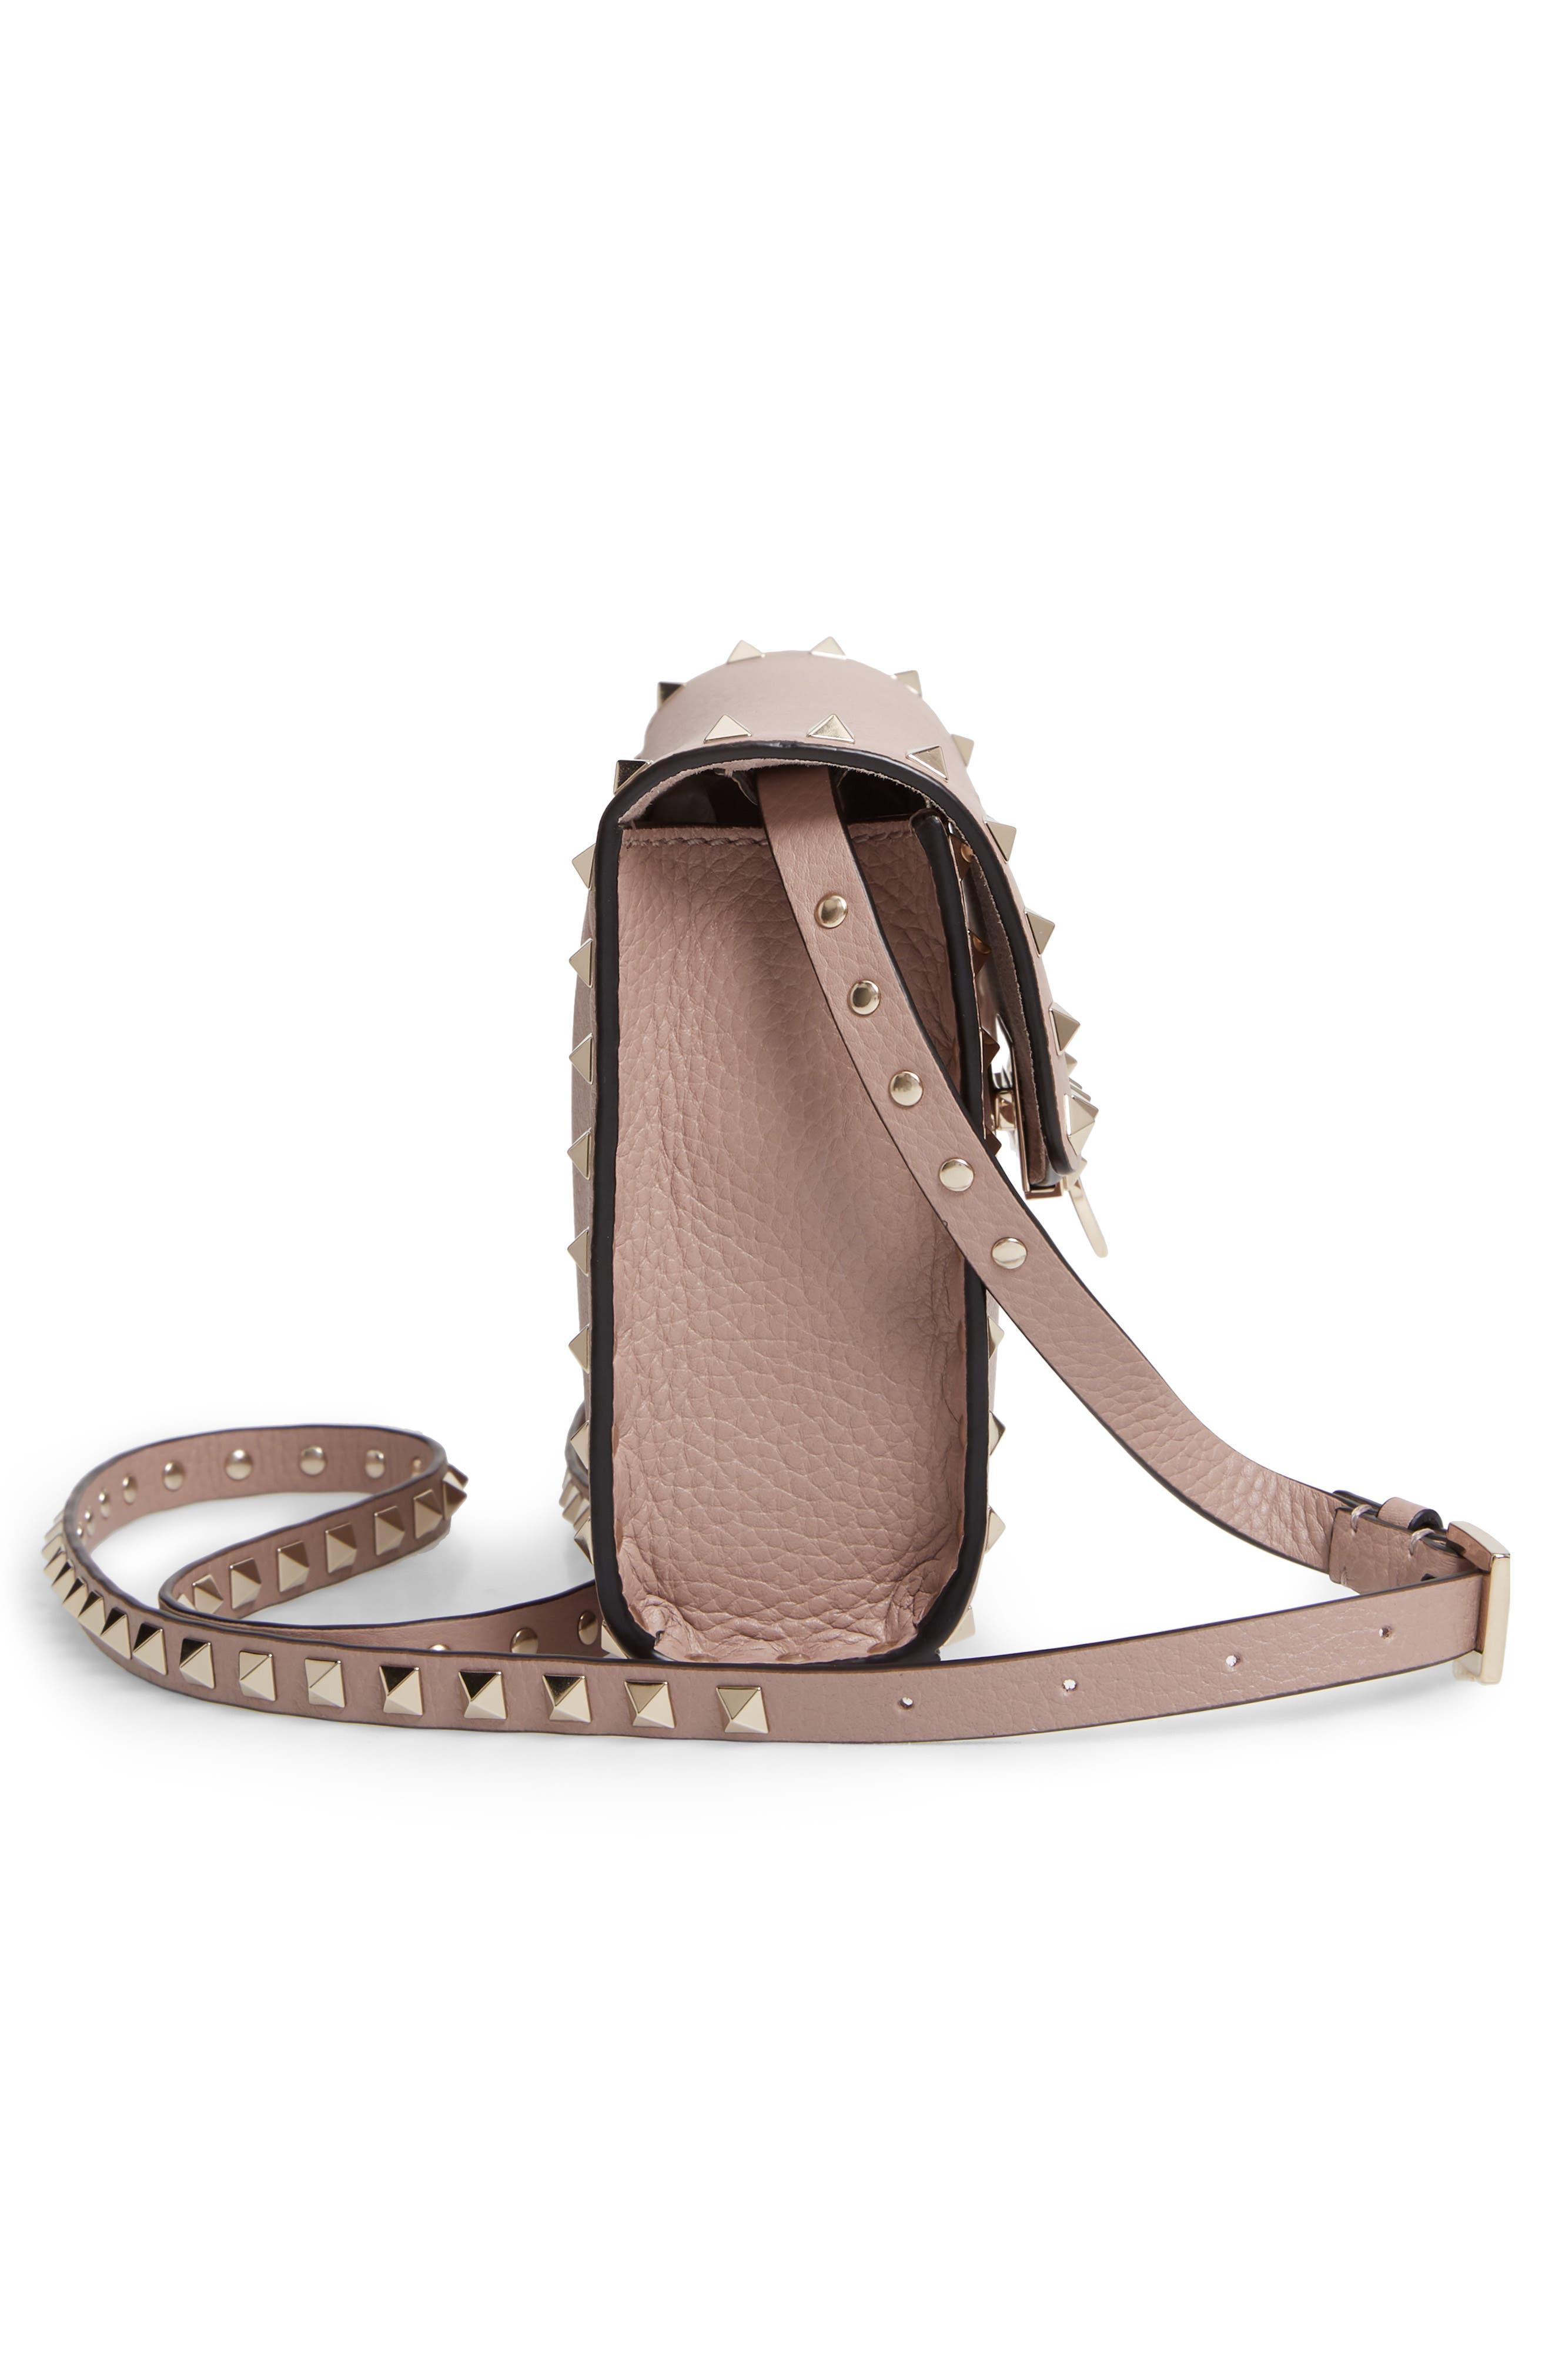 VALENTINO GARAVANI, Medium Rockstud Leather Crossbody Bag, Alternate thumbnail 5, color, POUDRE